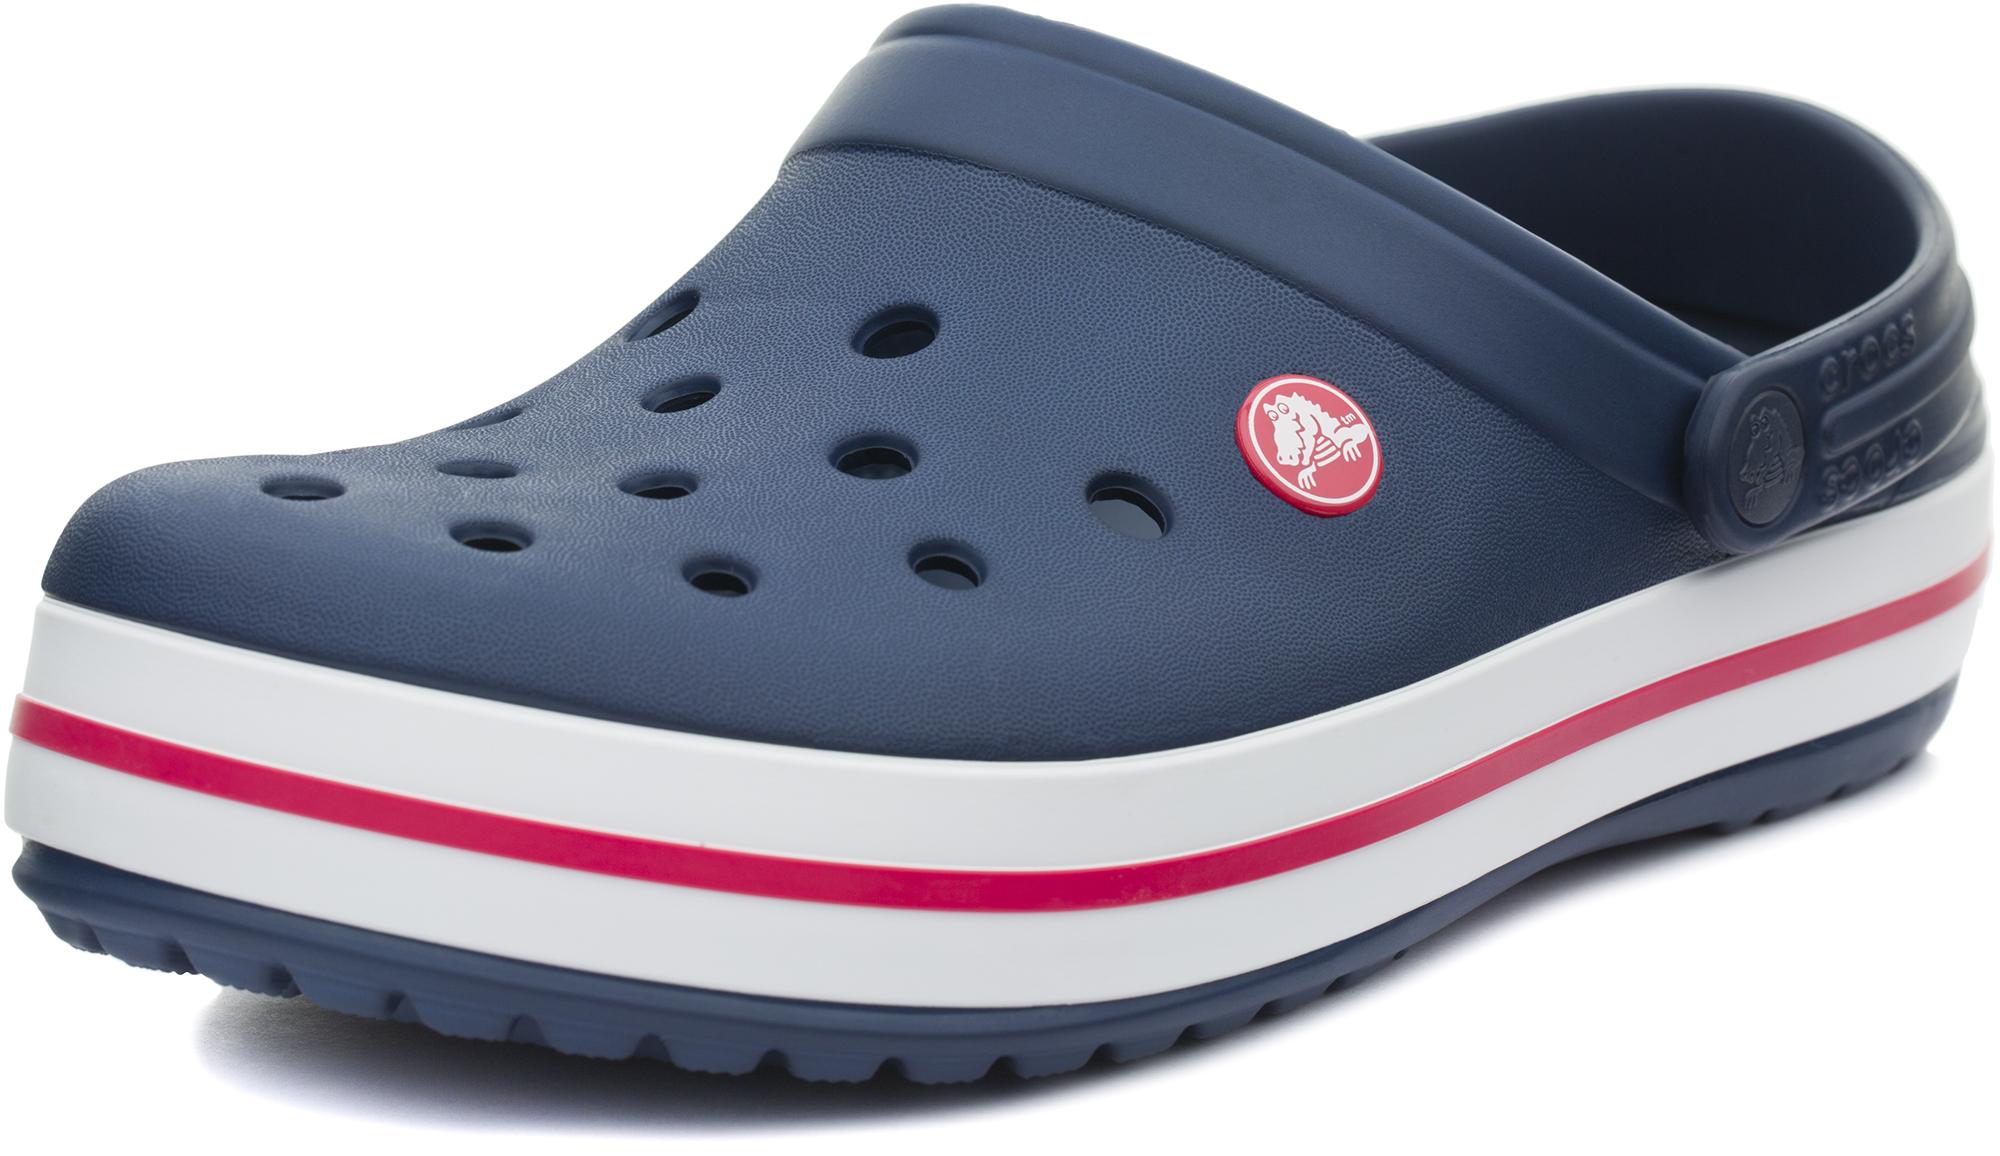 цена Crocs Шлепанцы Crocs Crocband, размер 39-40 онлайн в 2017 году